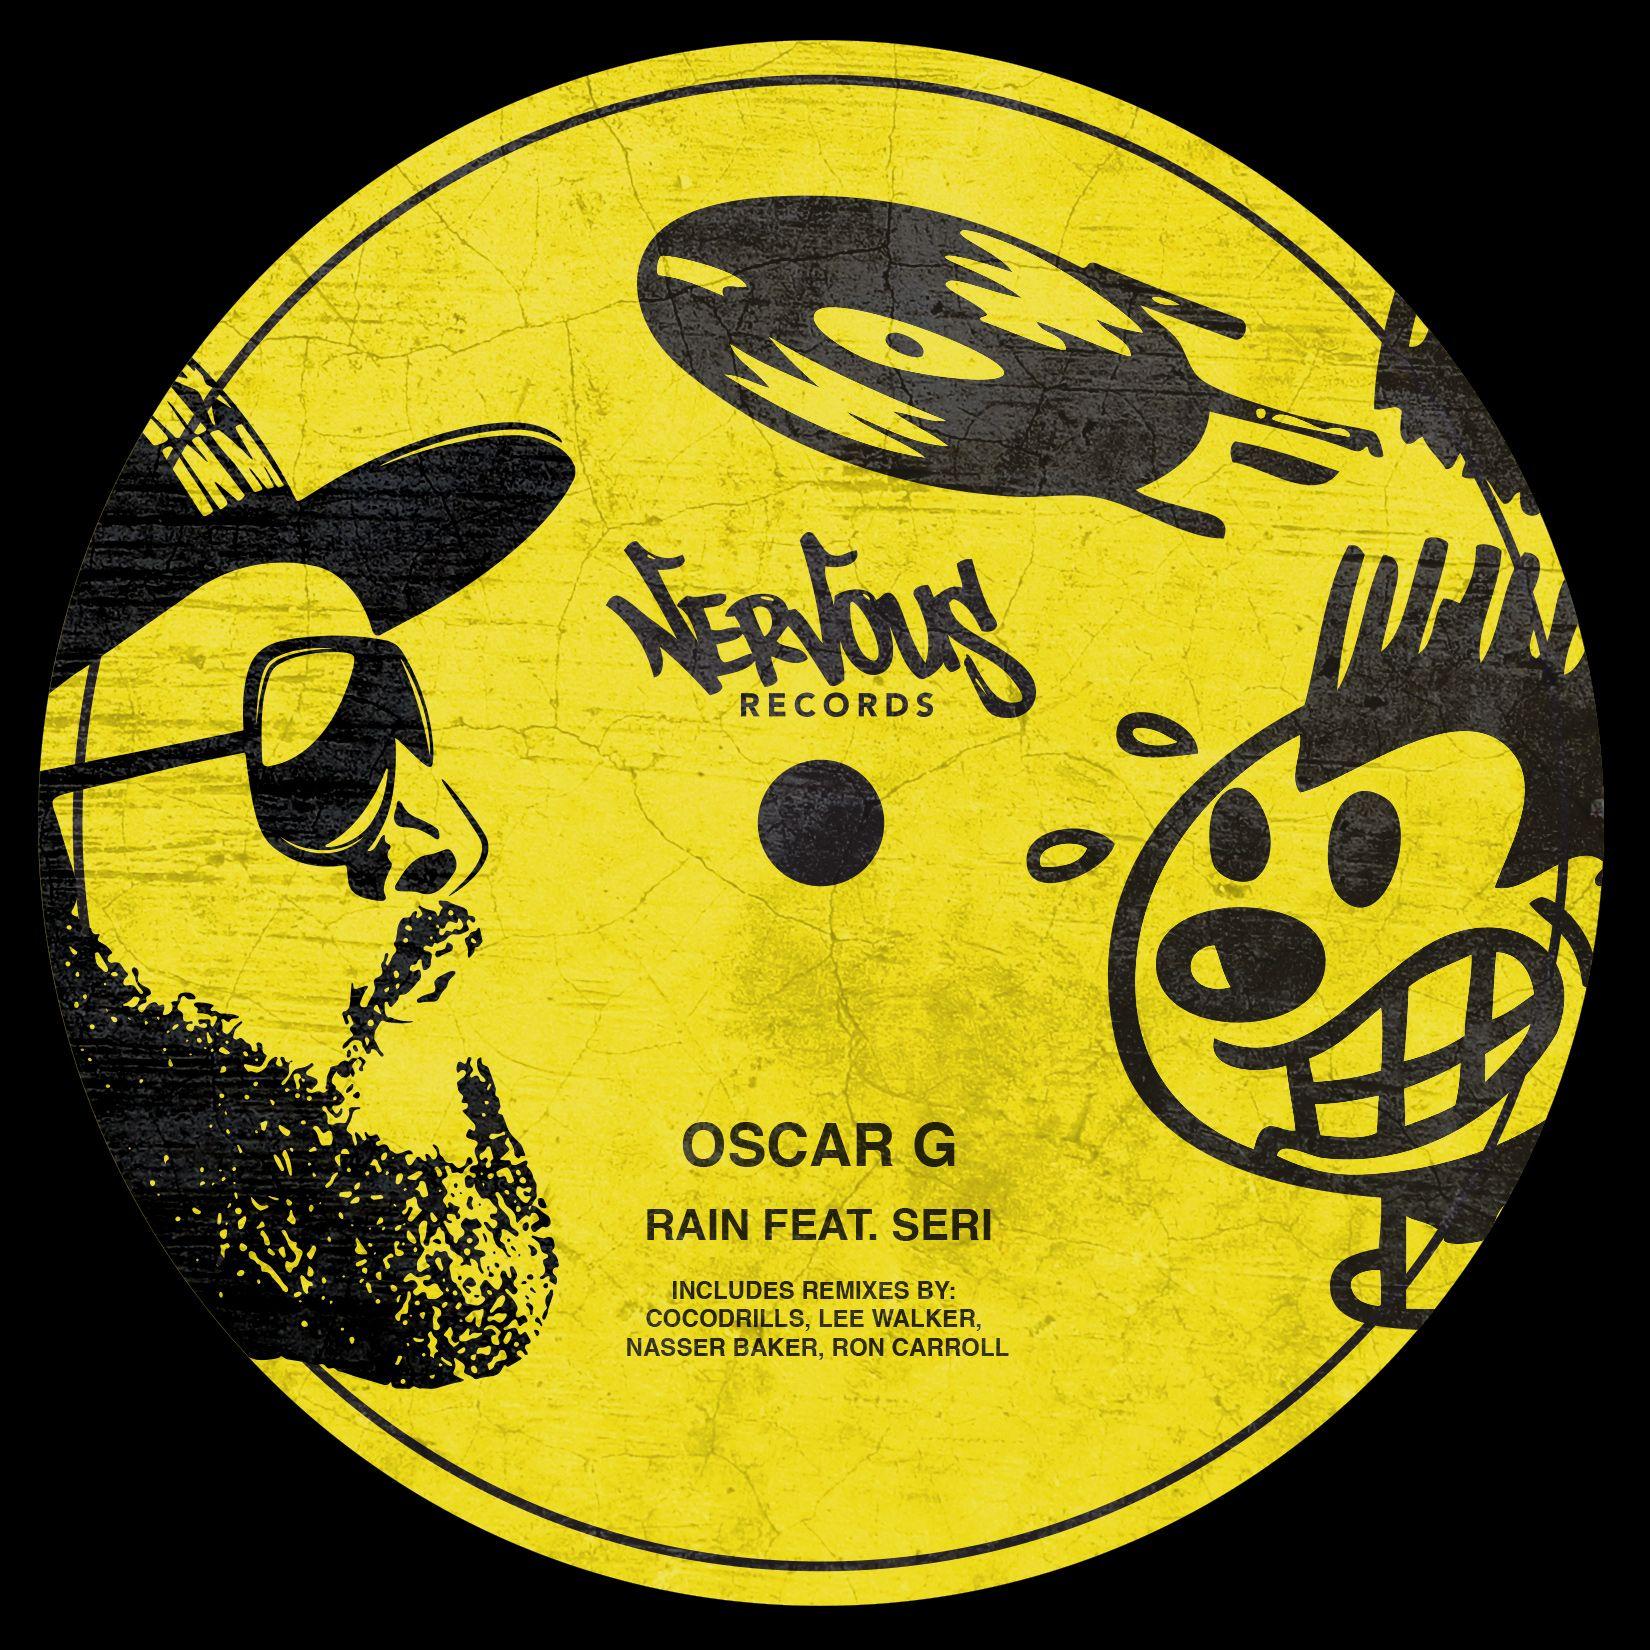 oscar-g-rain-feat.-seri-remixes.jpg